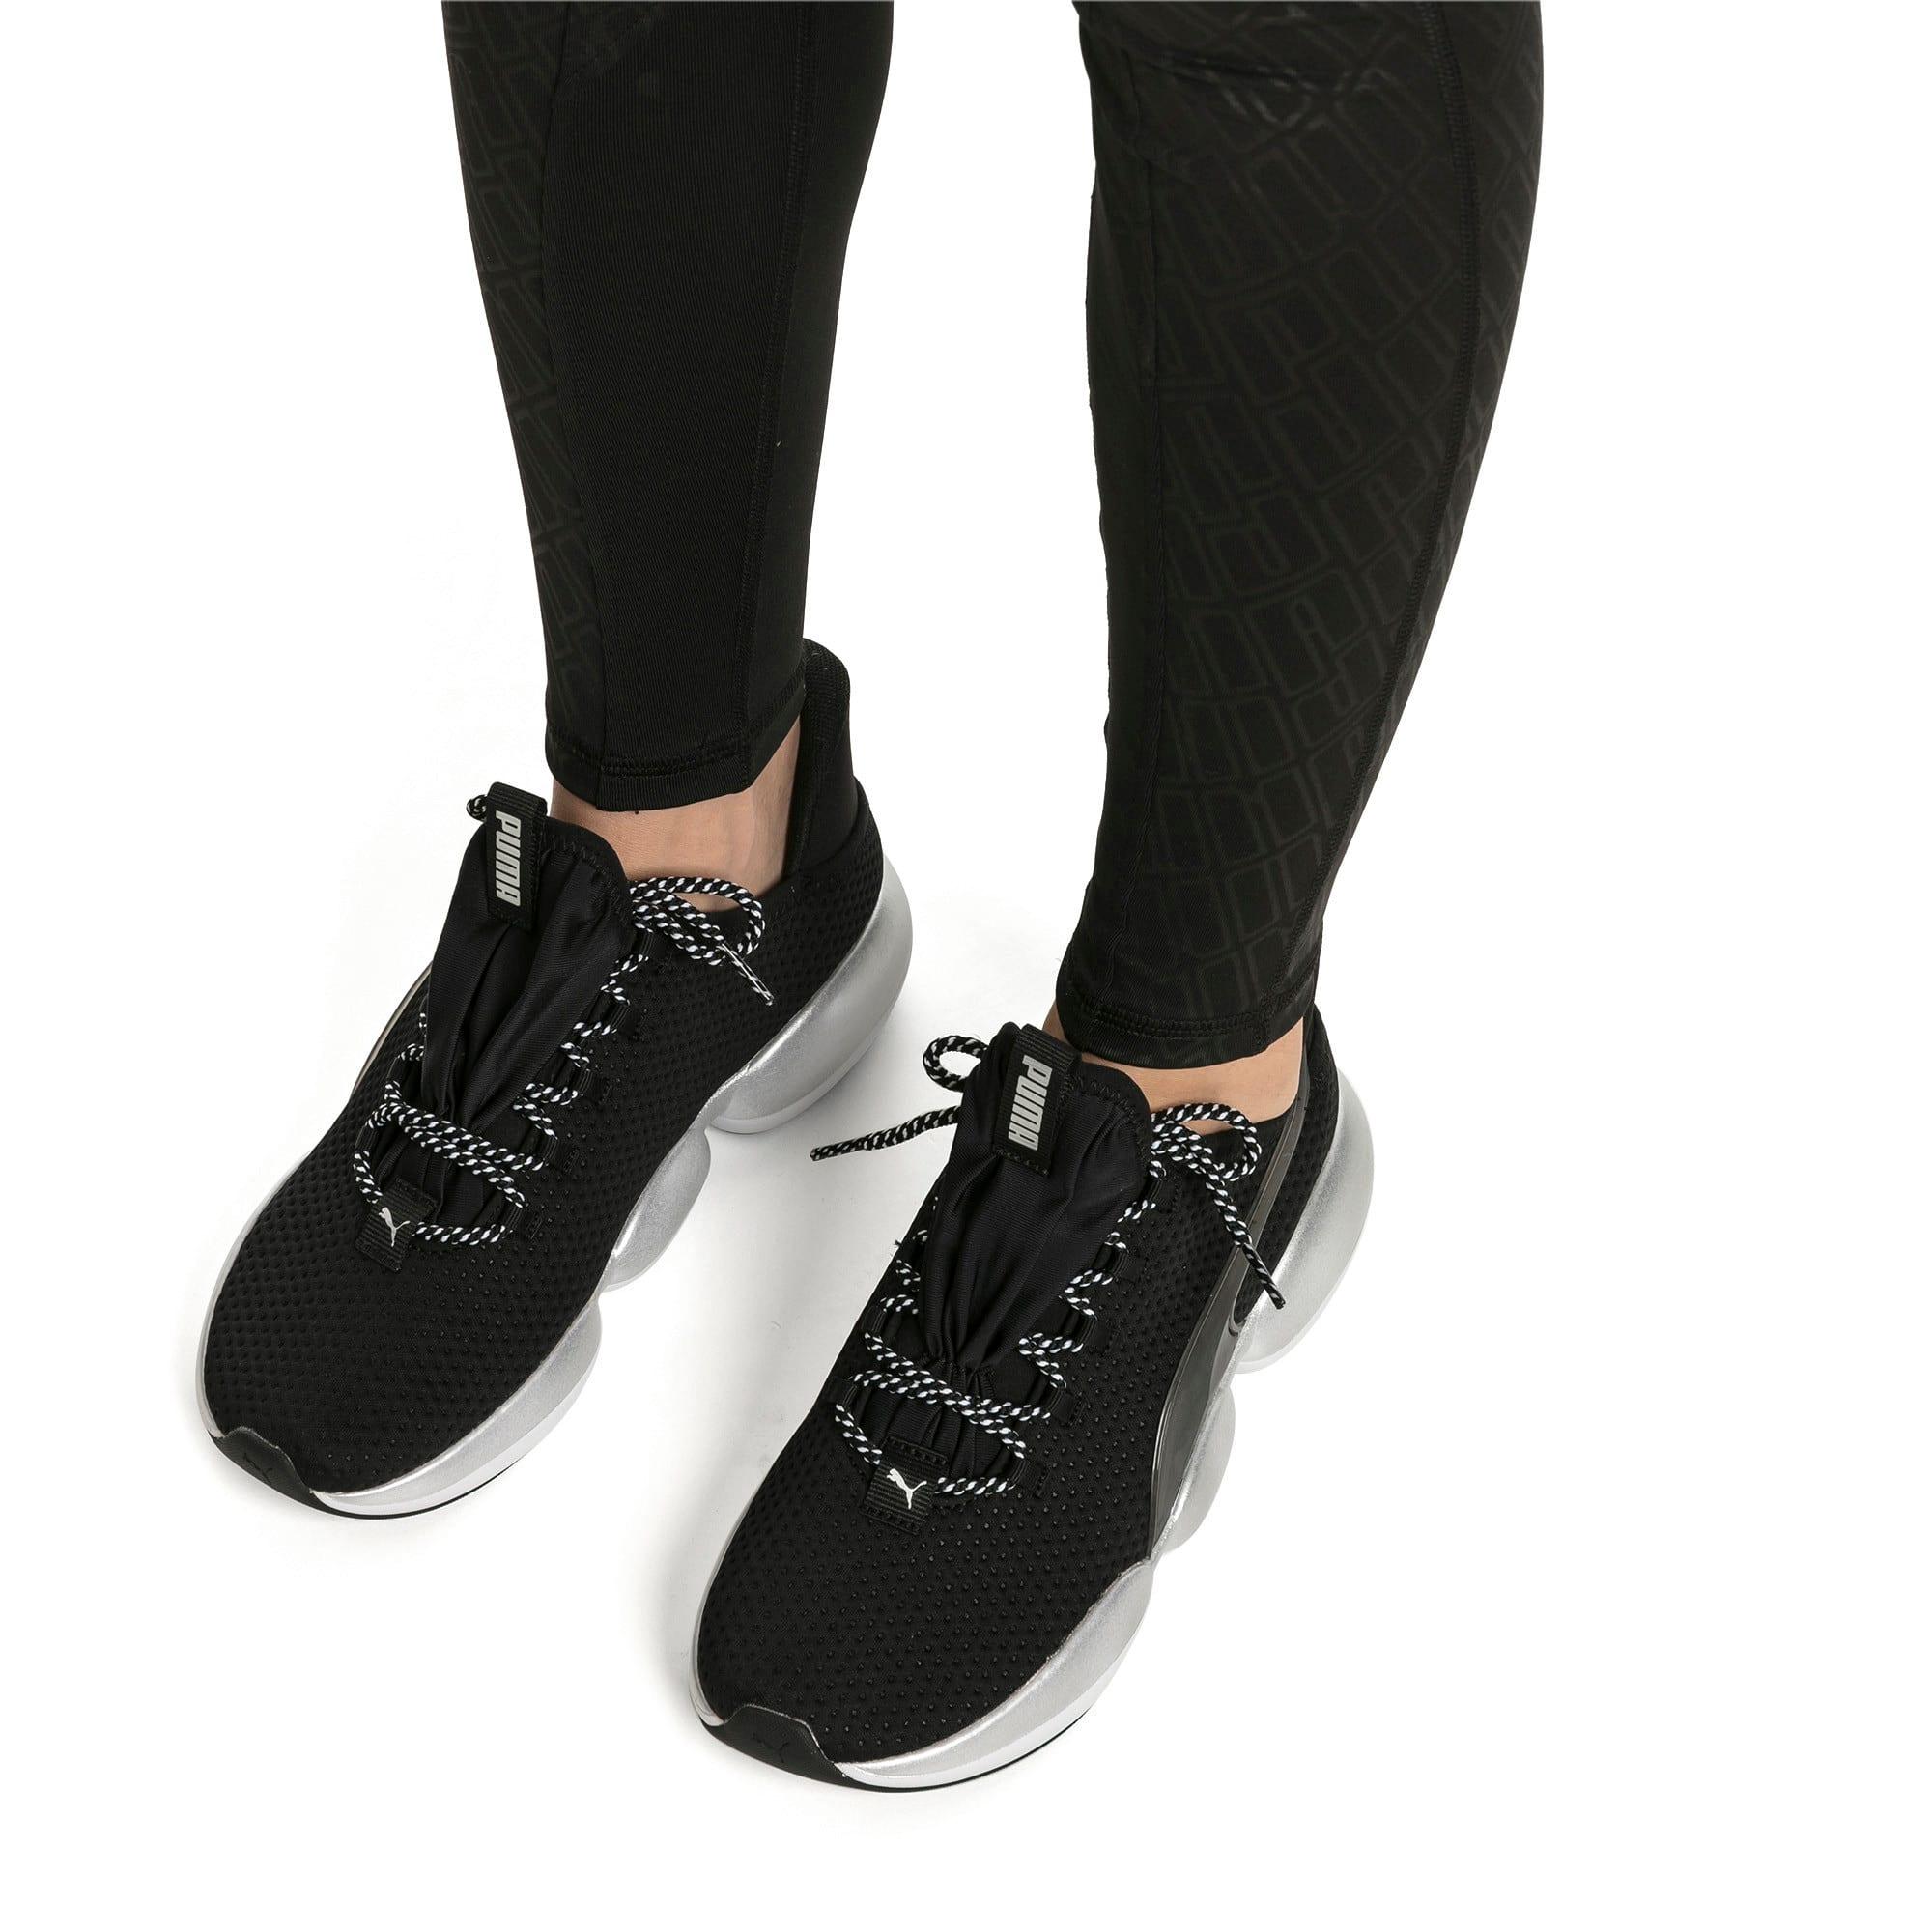 Imagen en miniatura 2 de Zapatillas de training de mujer Mode XT, Puma Black-Puma White, mediana